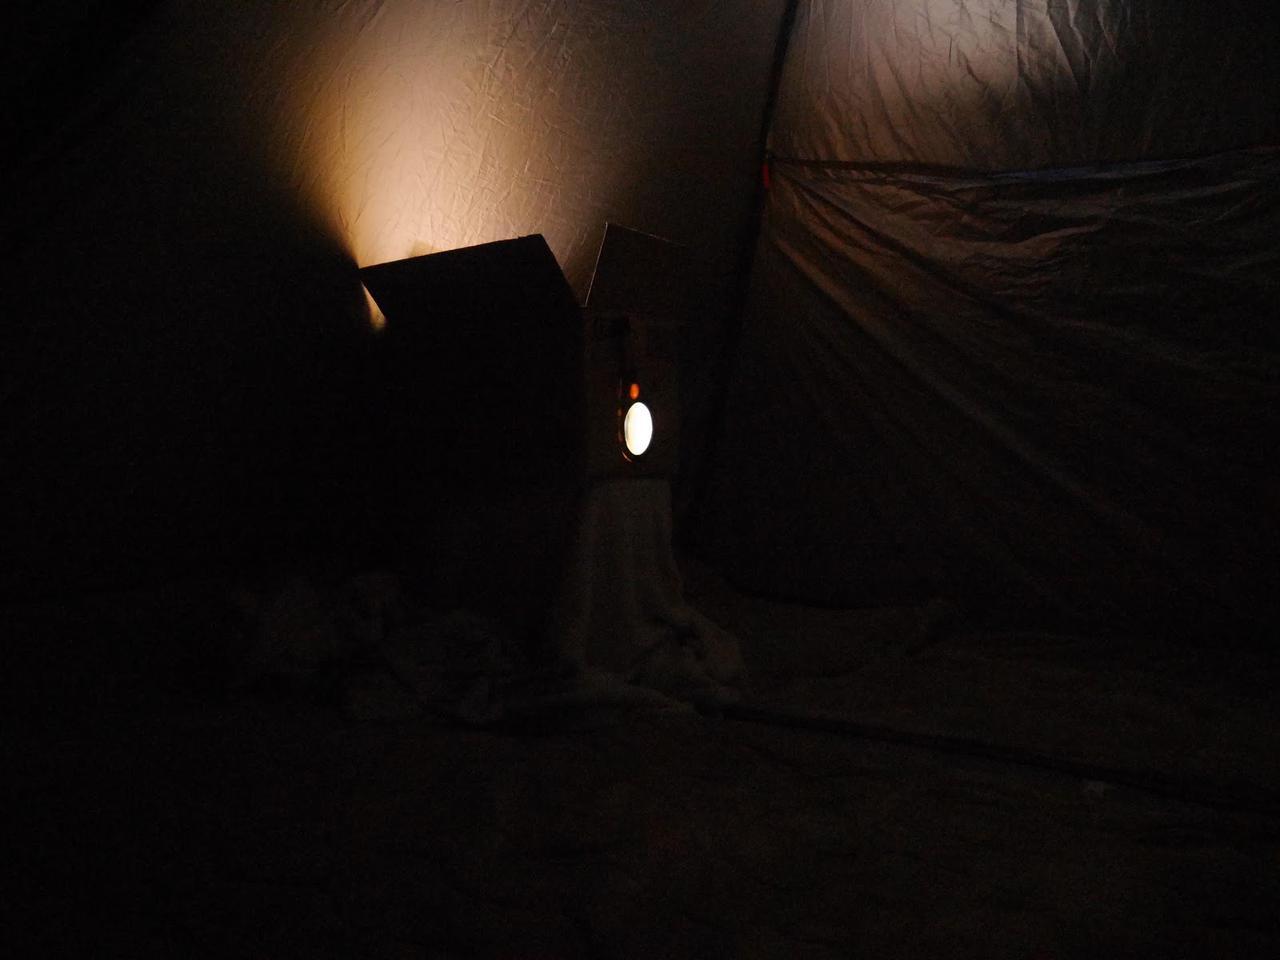 画像4: 筆者撮影